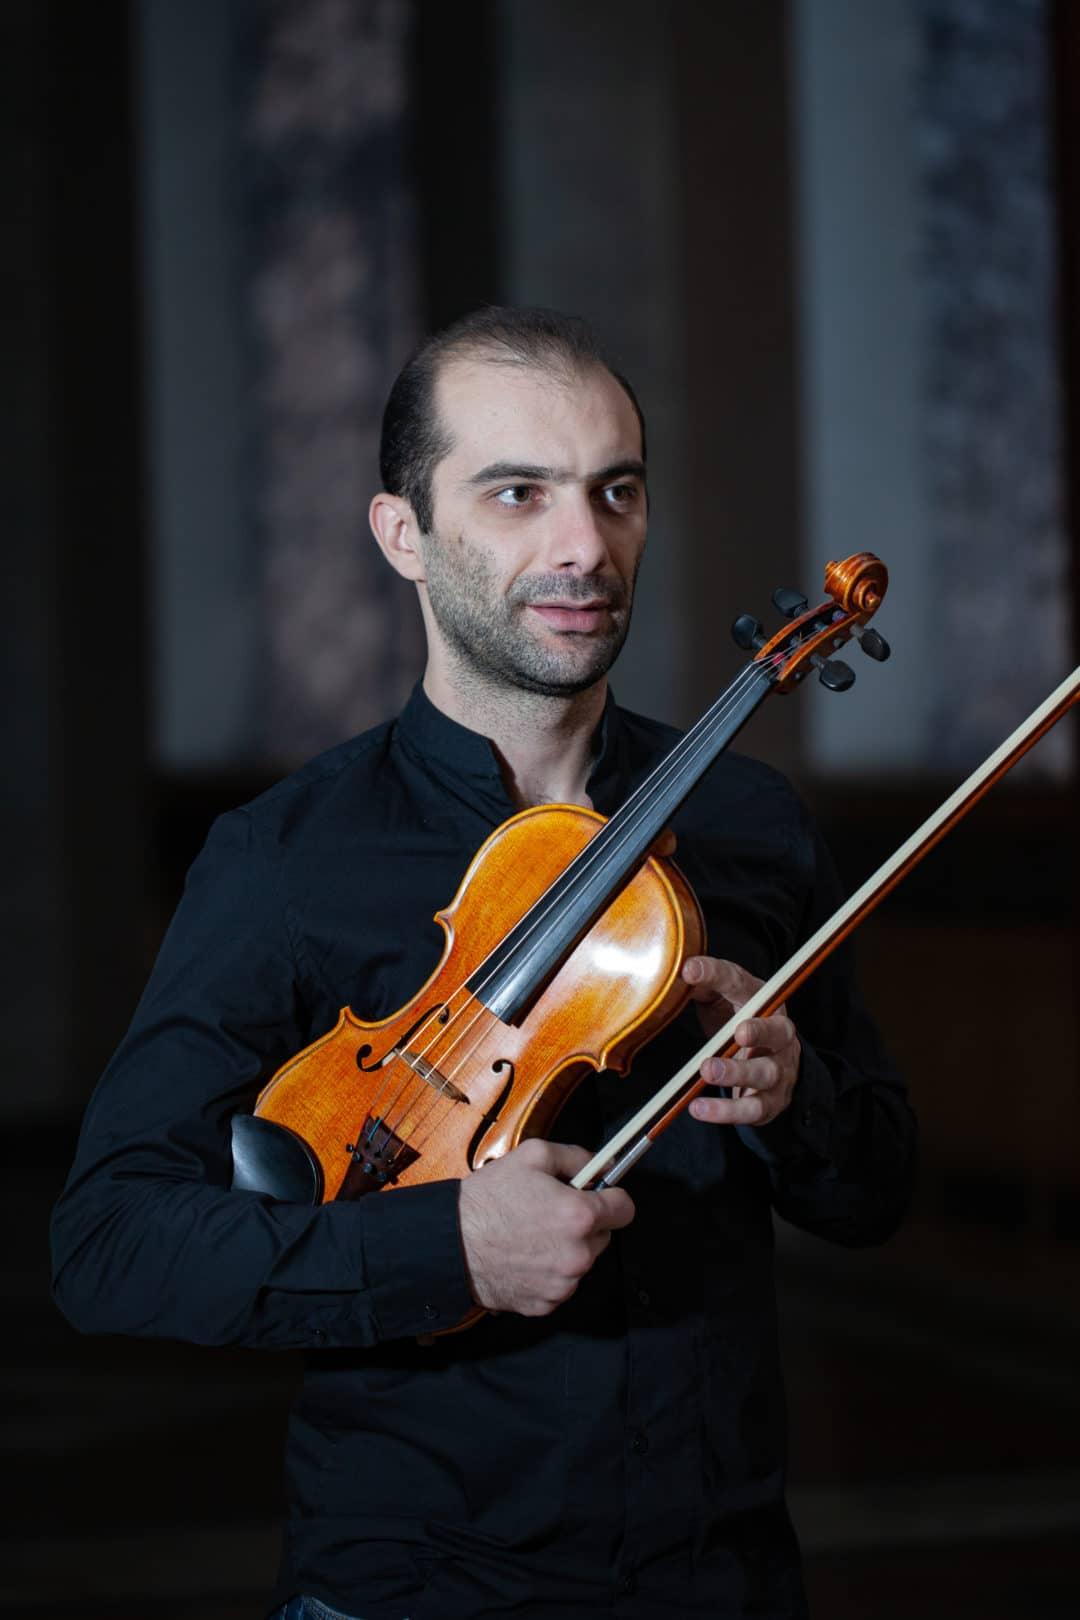 Artashes Melikyan